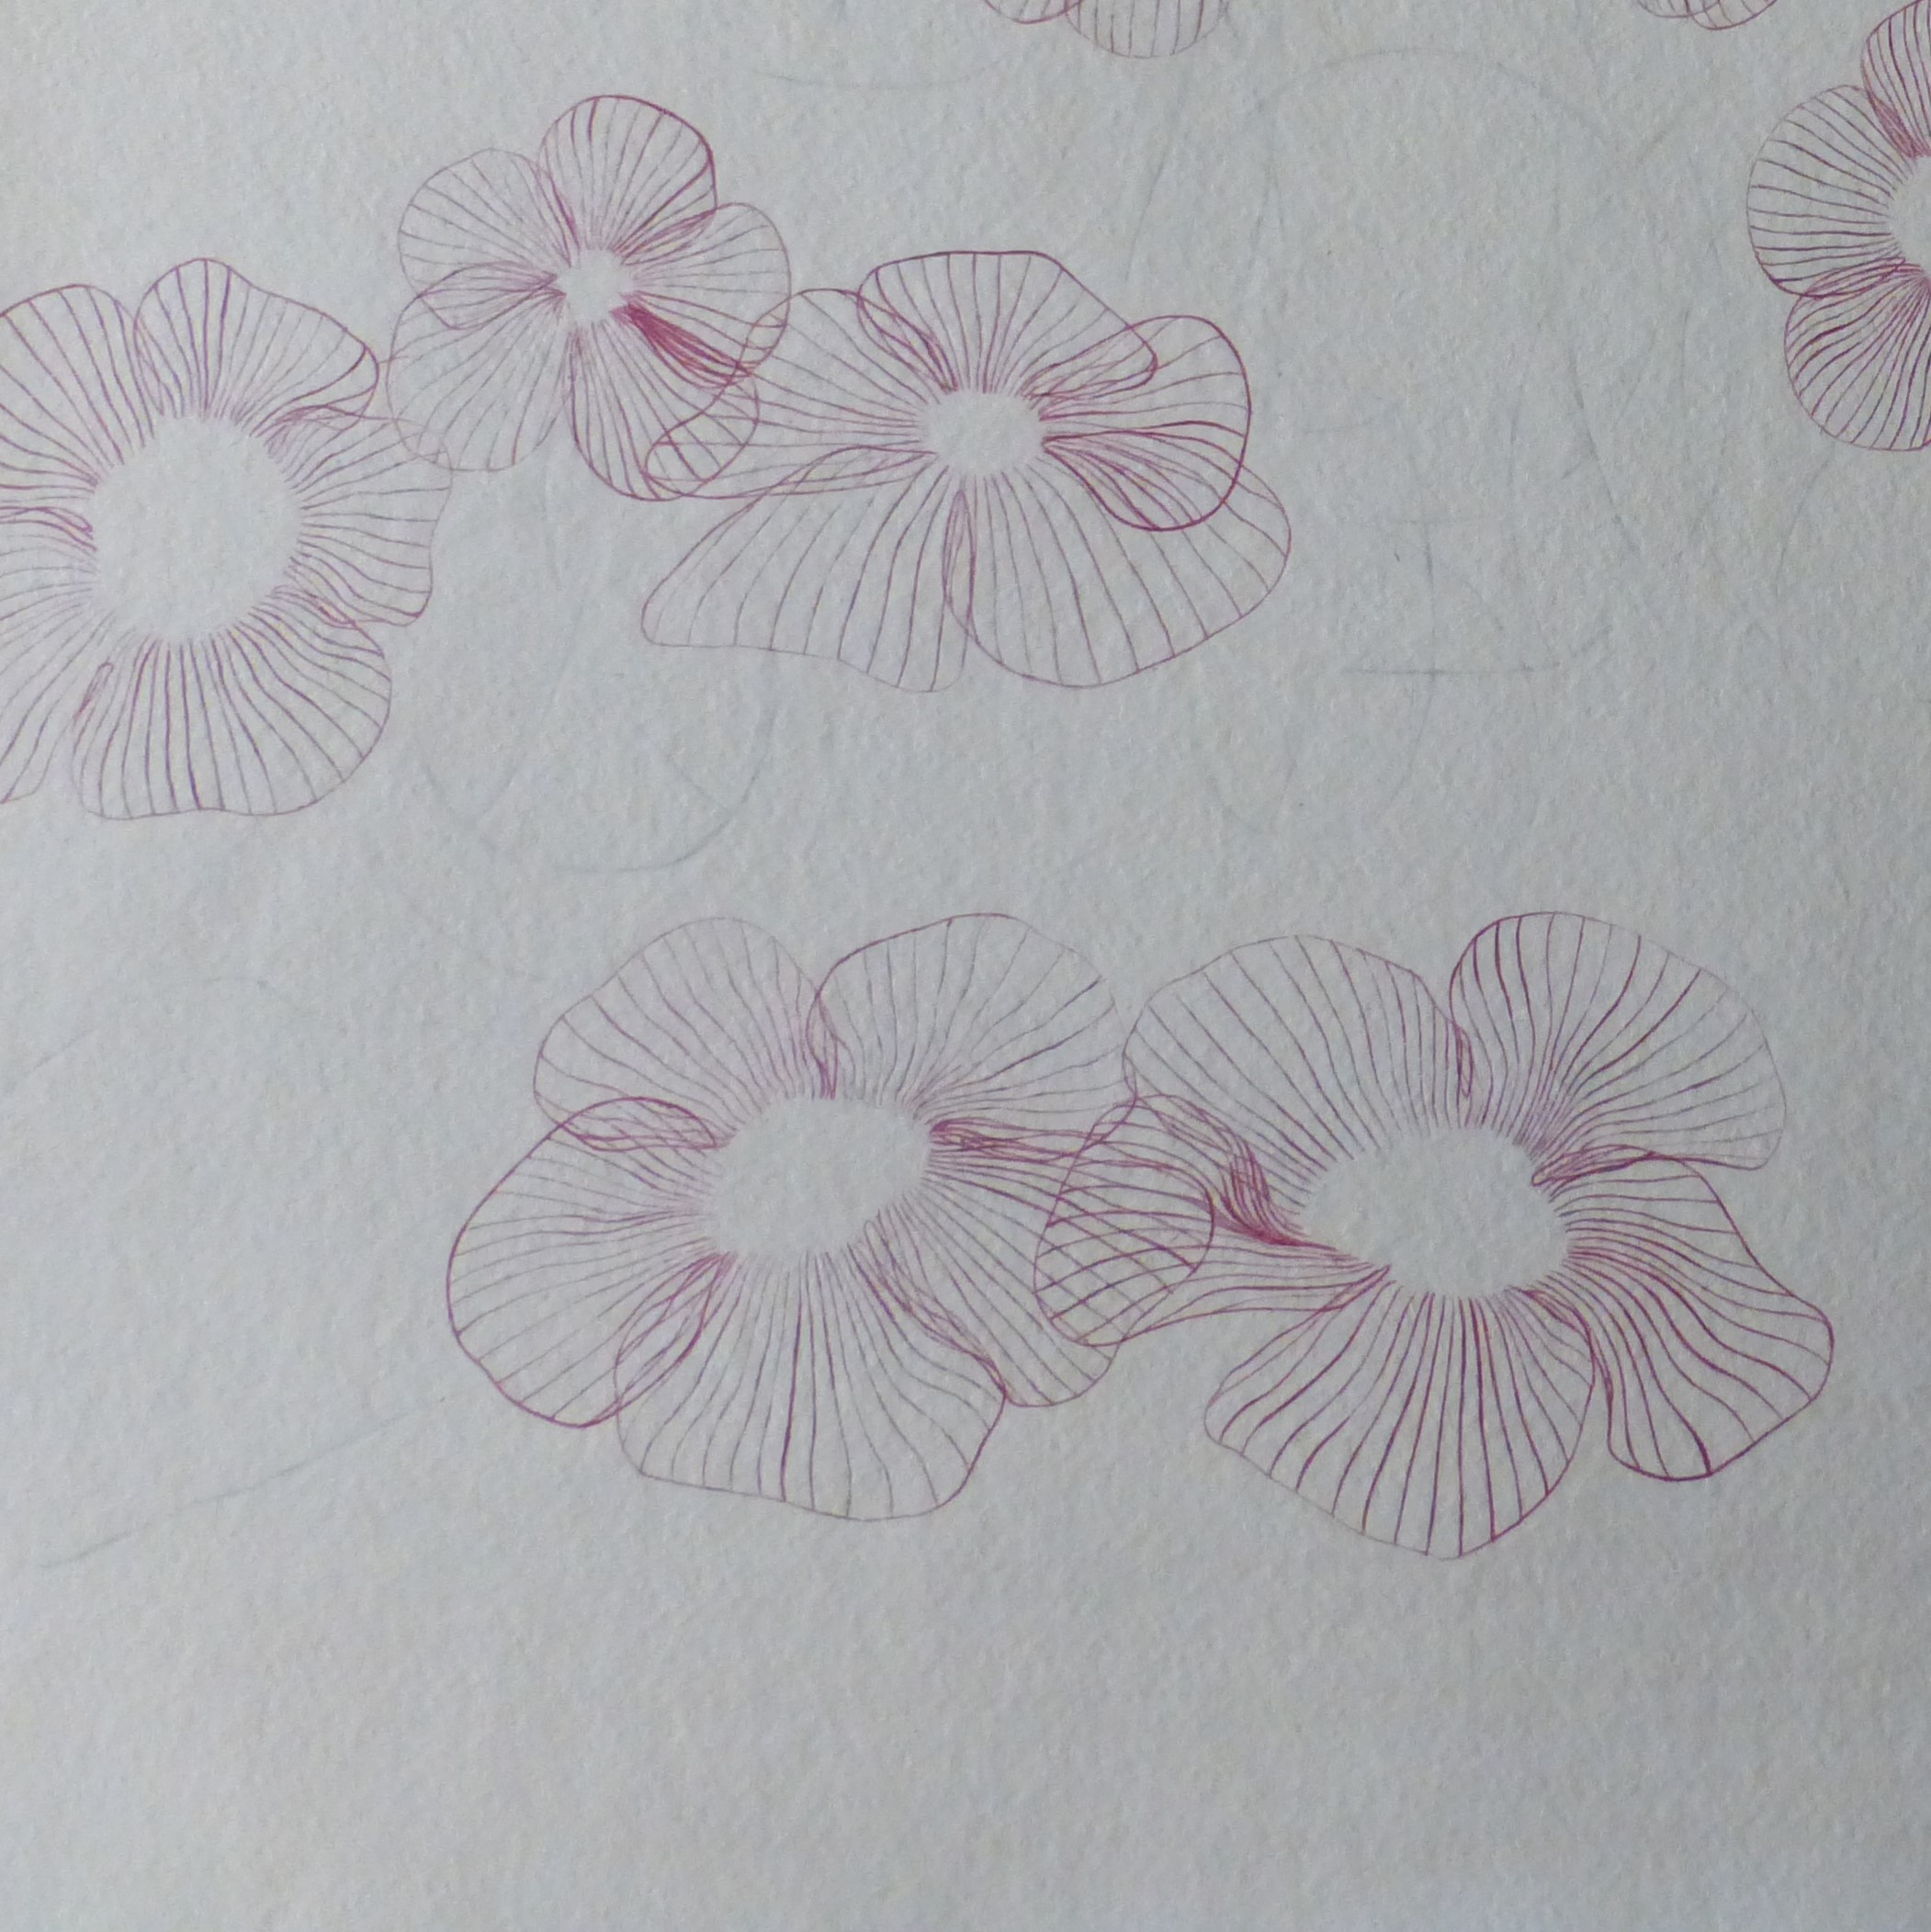 flowers ii, edit i 012119, detail (4)